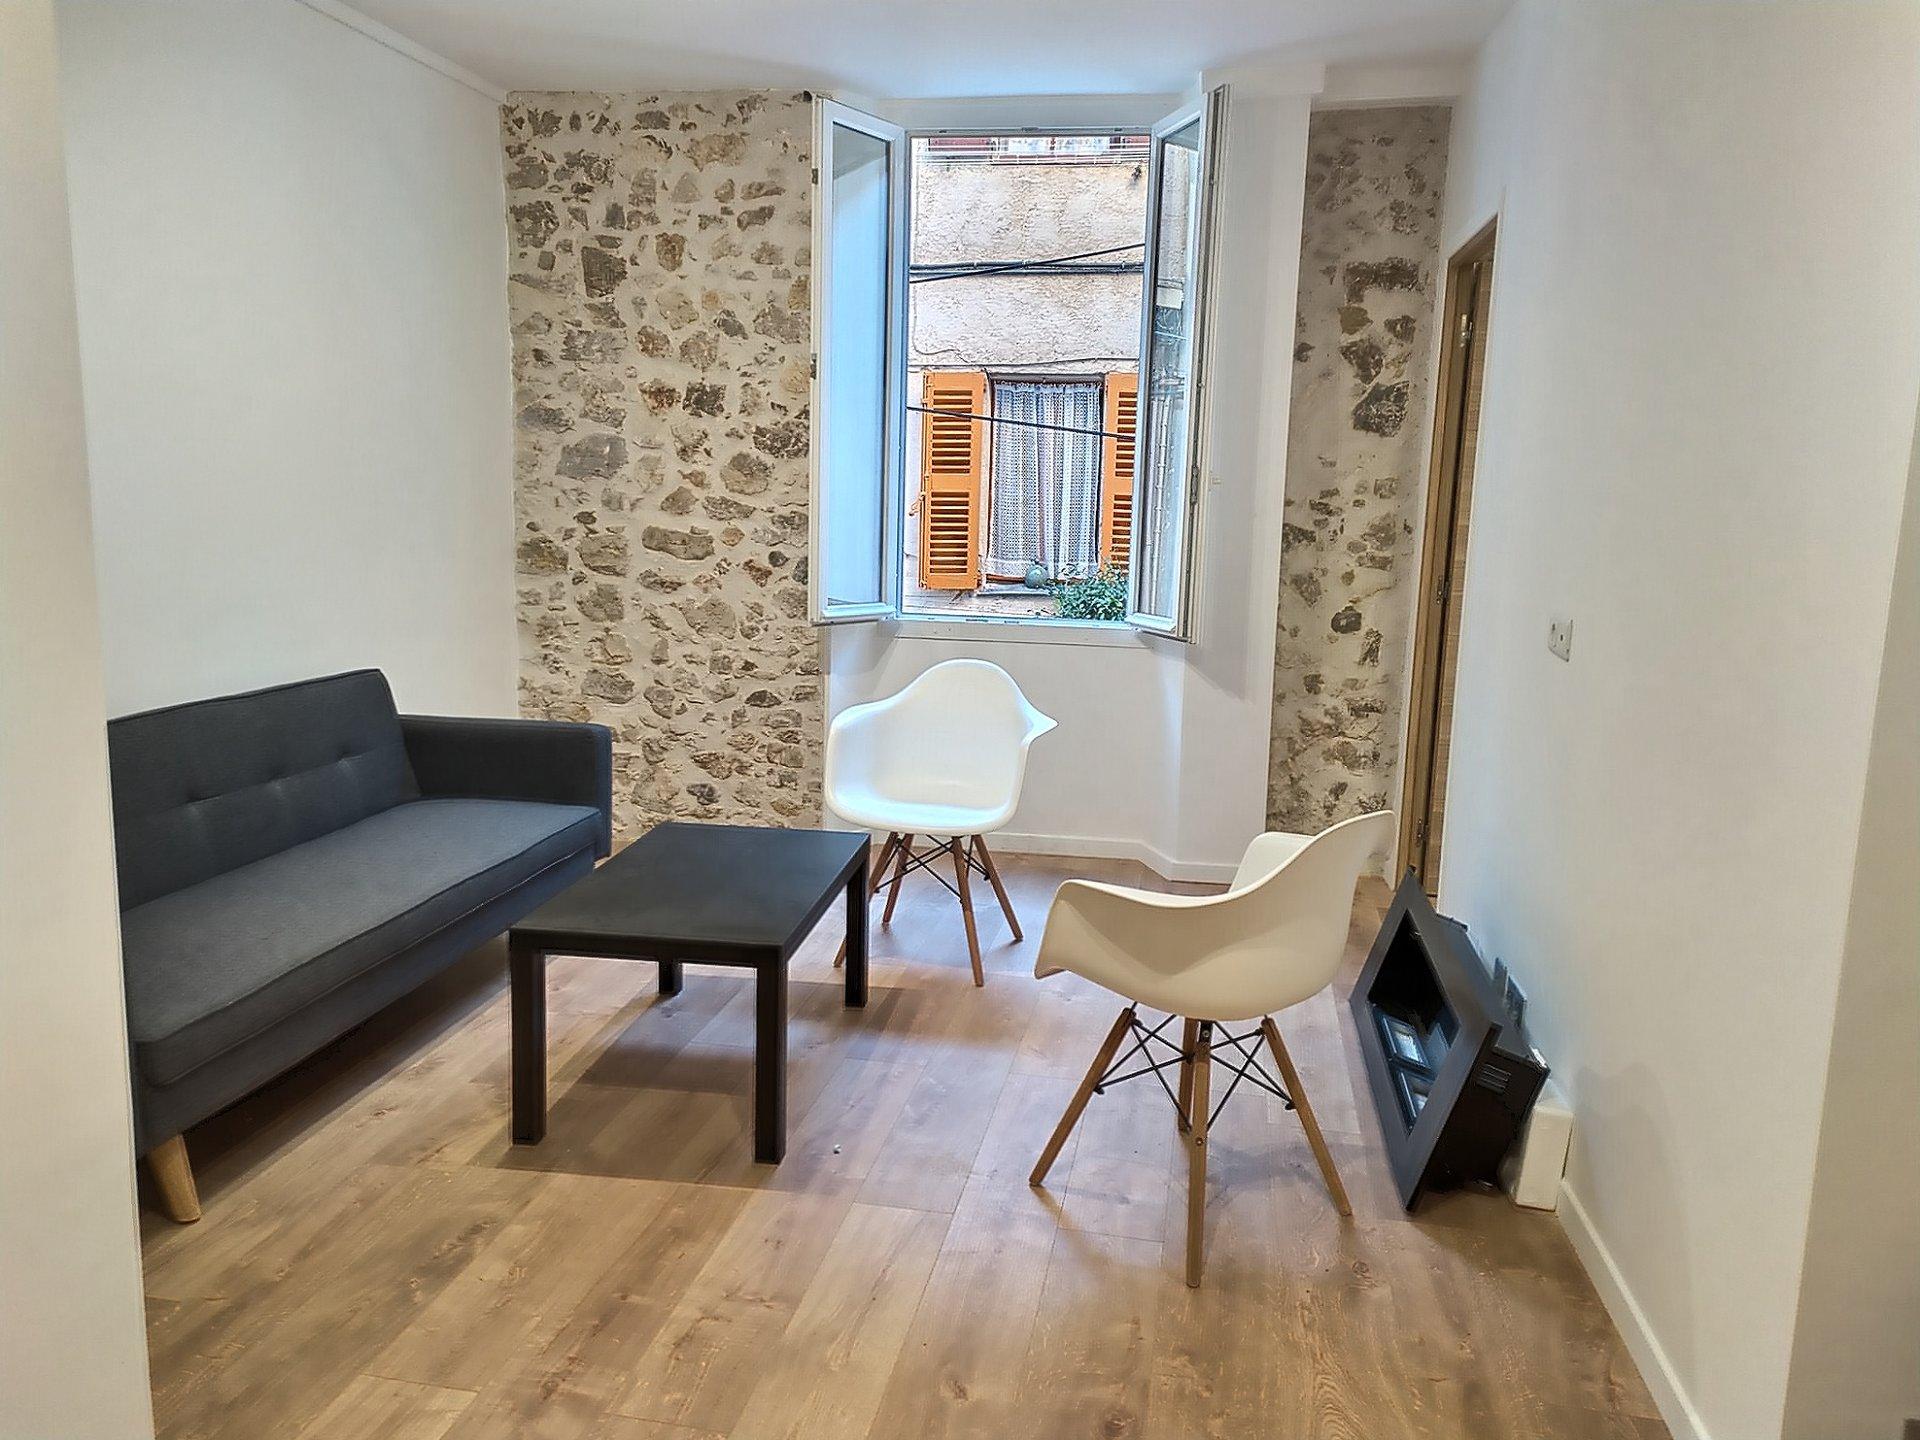 ANTIBES Old Town - 1 Bedroom 34.43 square meter